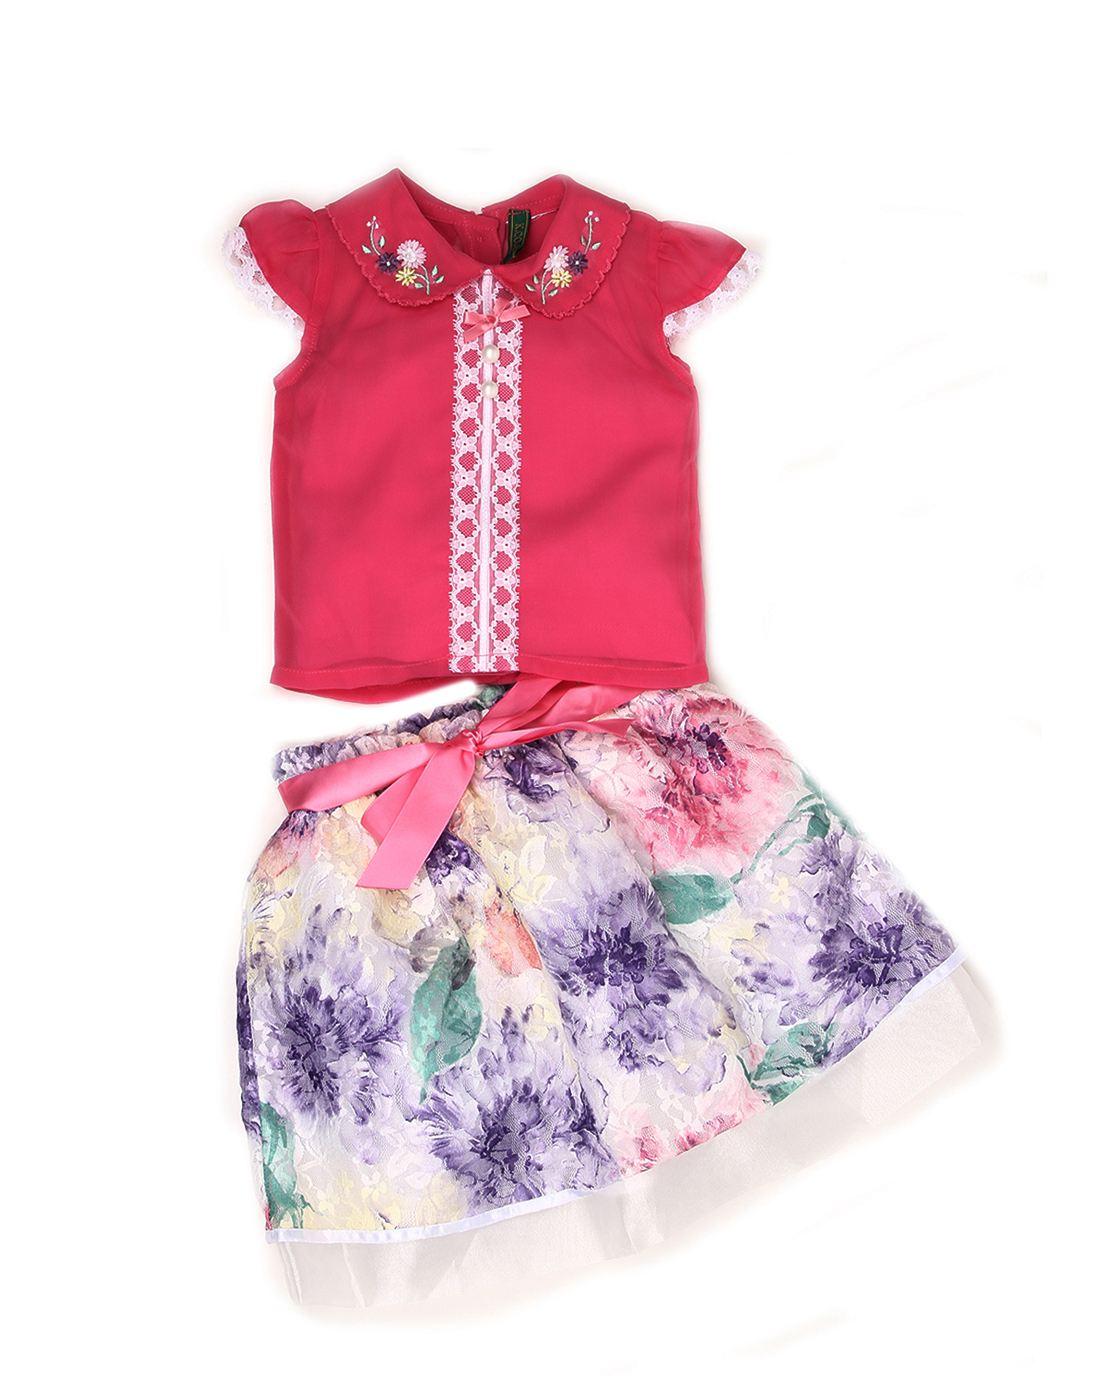 K.C.O 89 Baby Girls Party Printed Fashion Sleeve Skirt Set